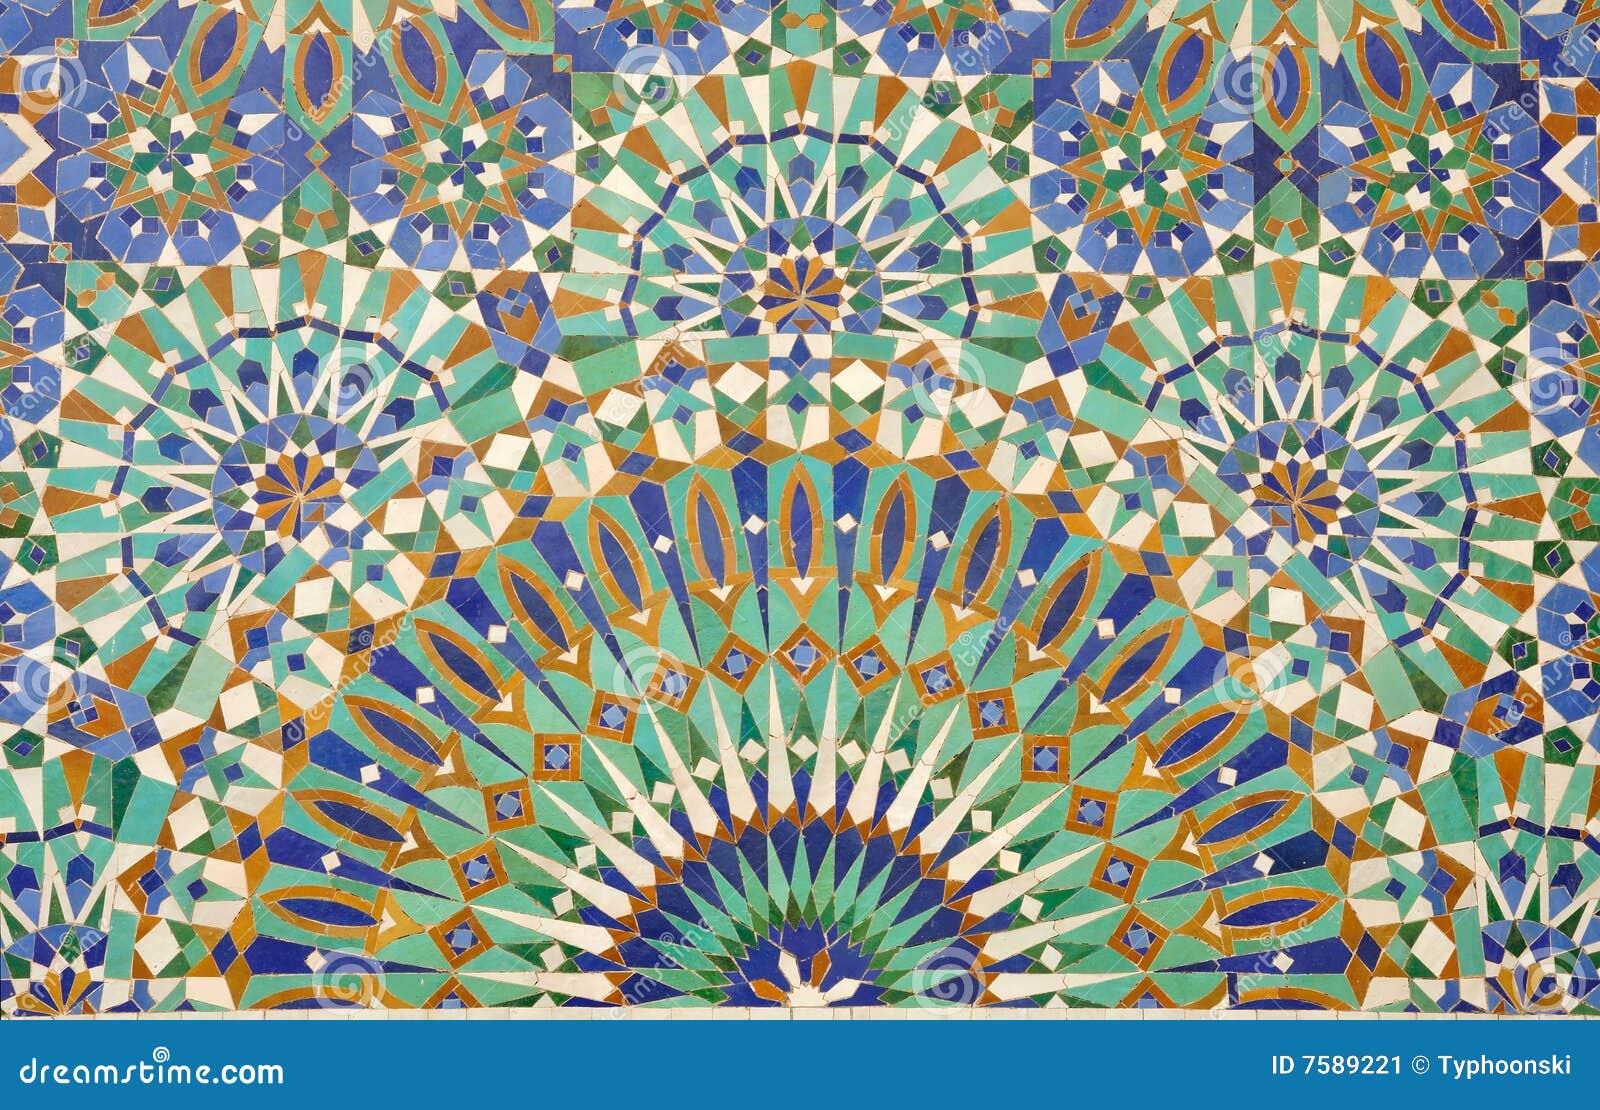 oriental mosaic decoration stock image image 7589221. Black Bedroom Furniture Sets. Home Design Ideas